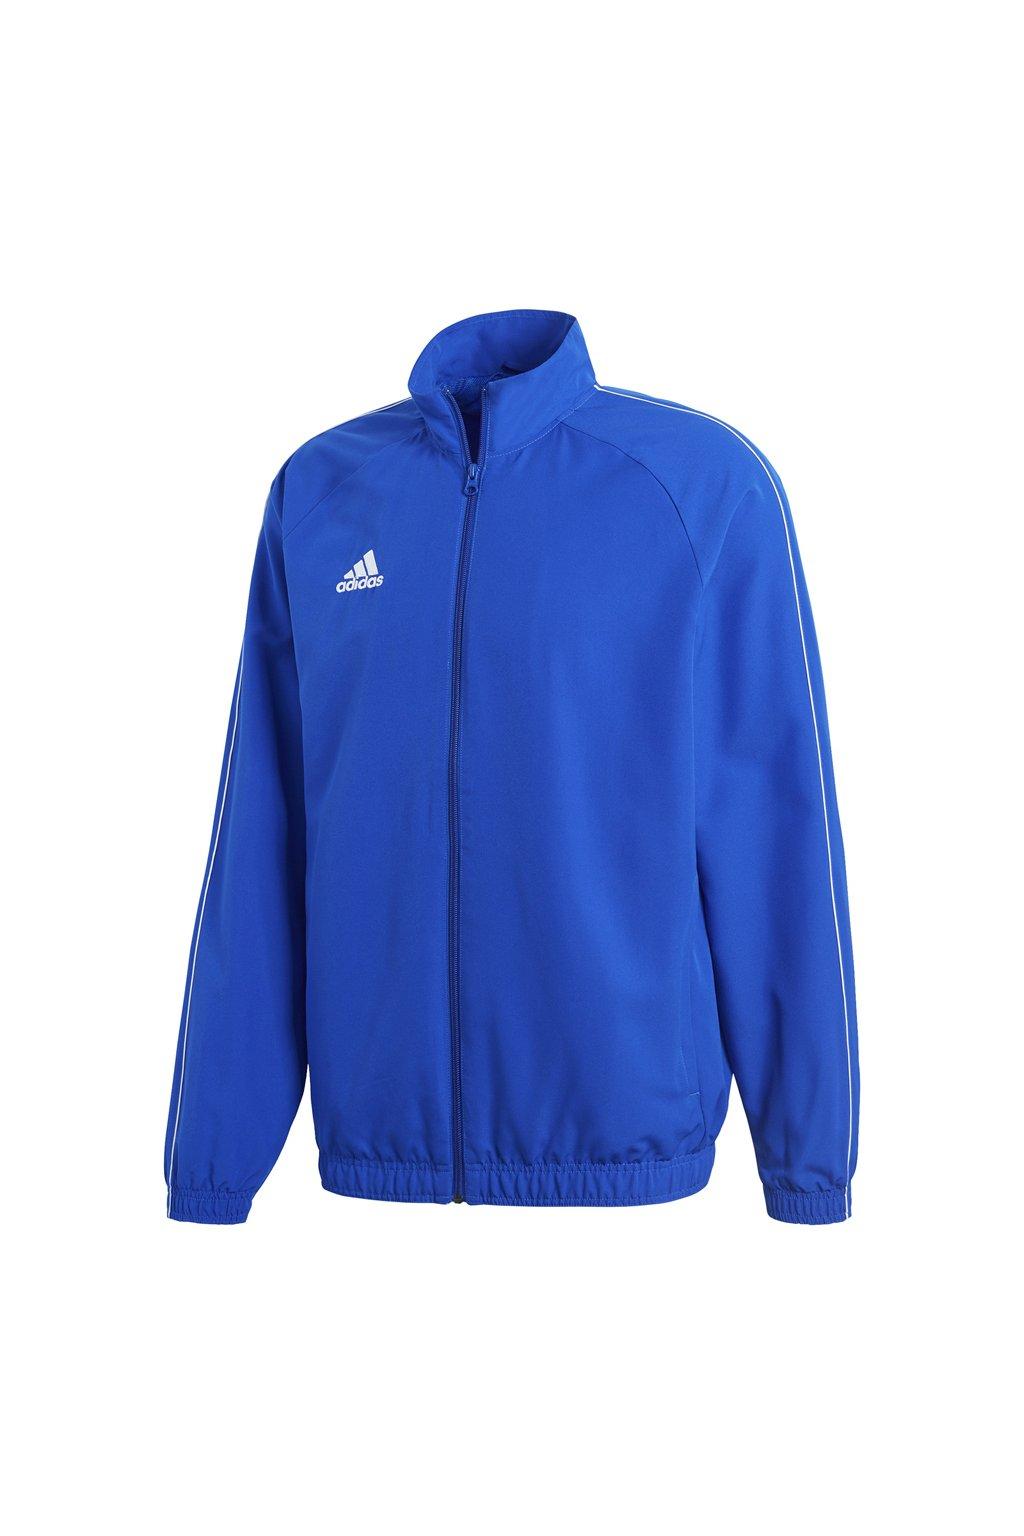 Pánska bunda Adidas Core 18 modrá CV3685